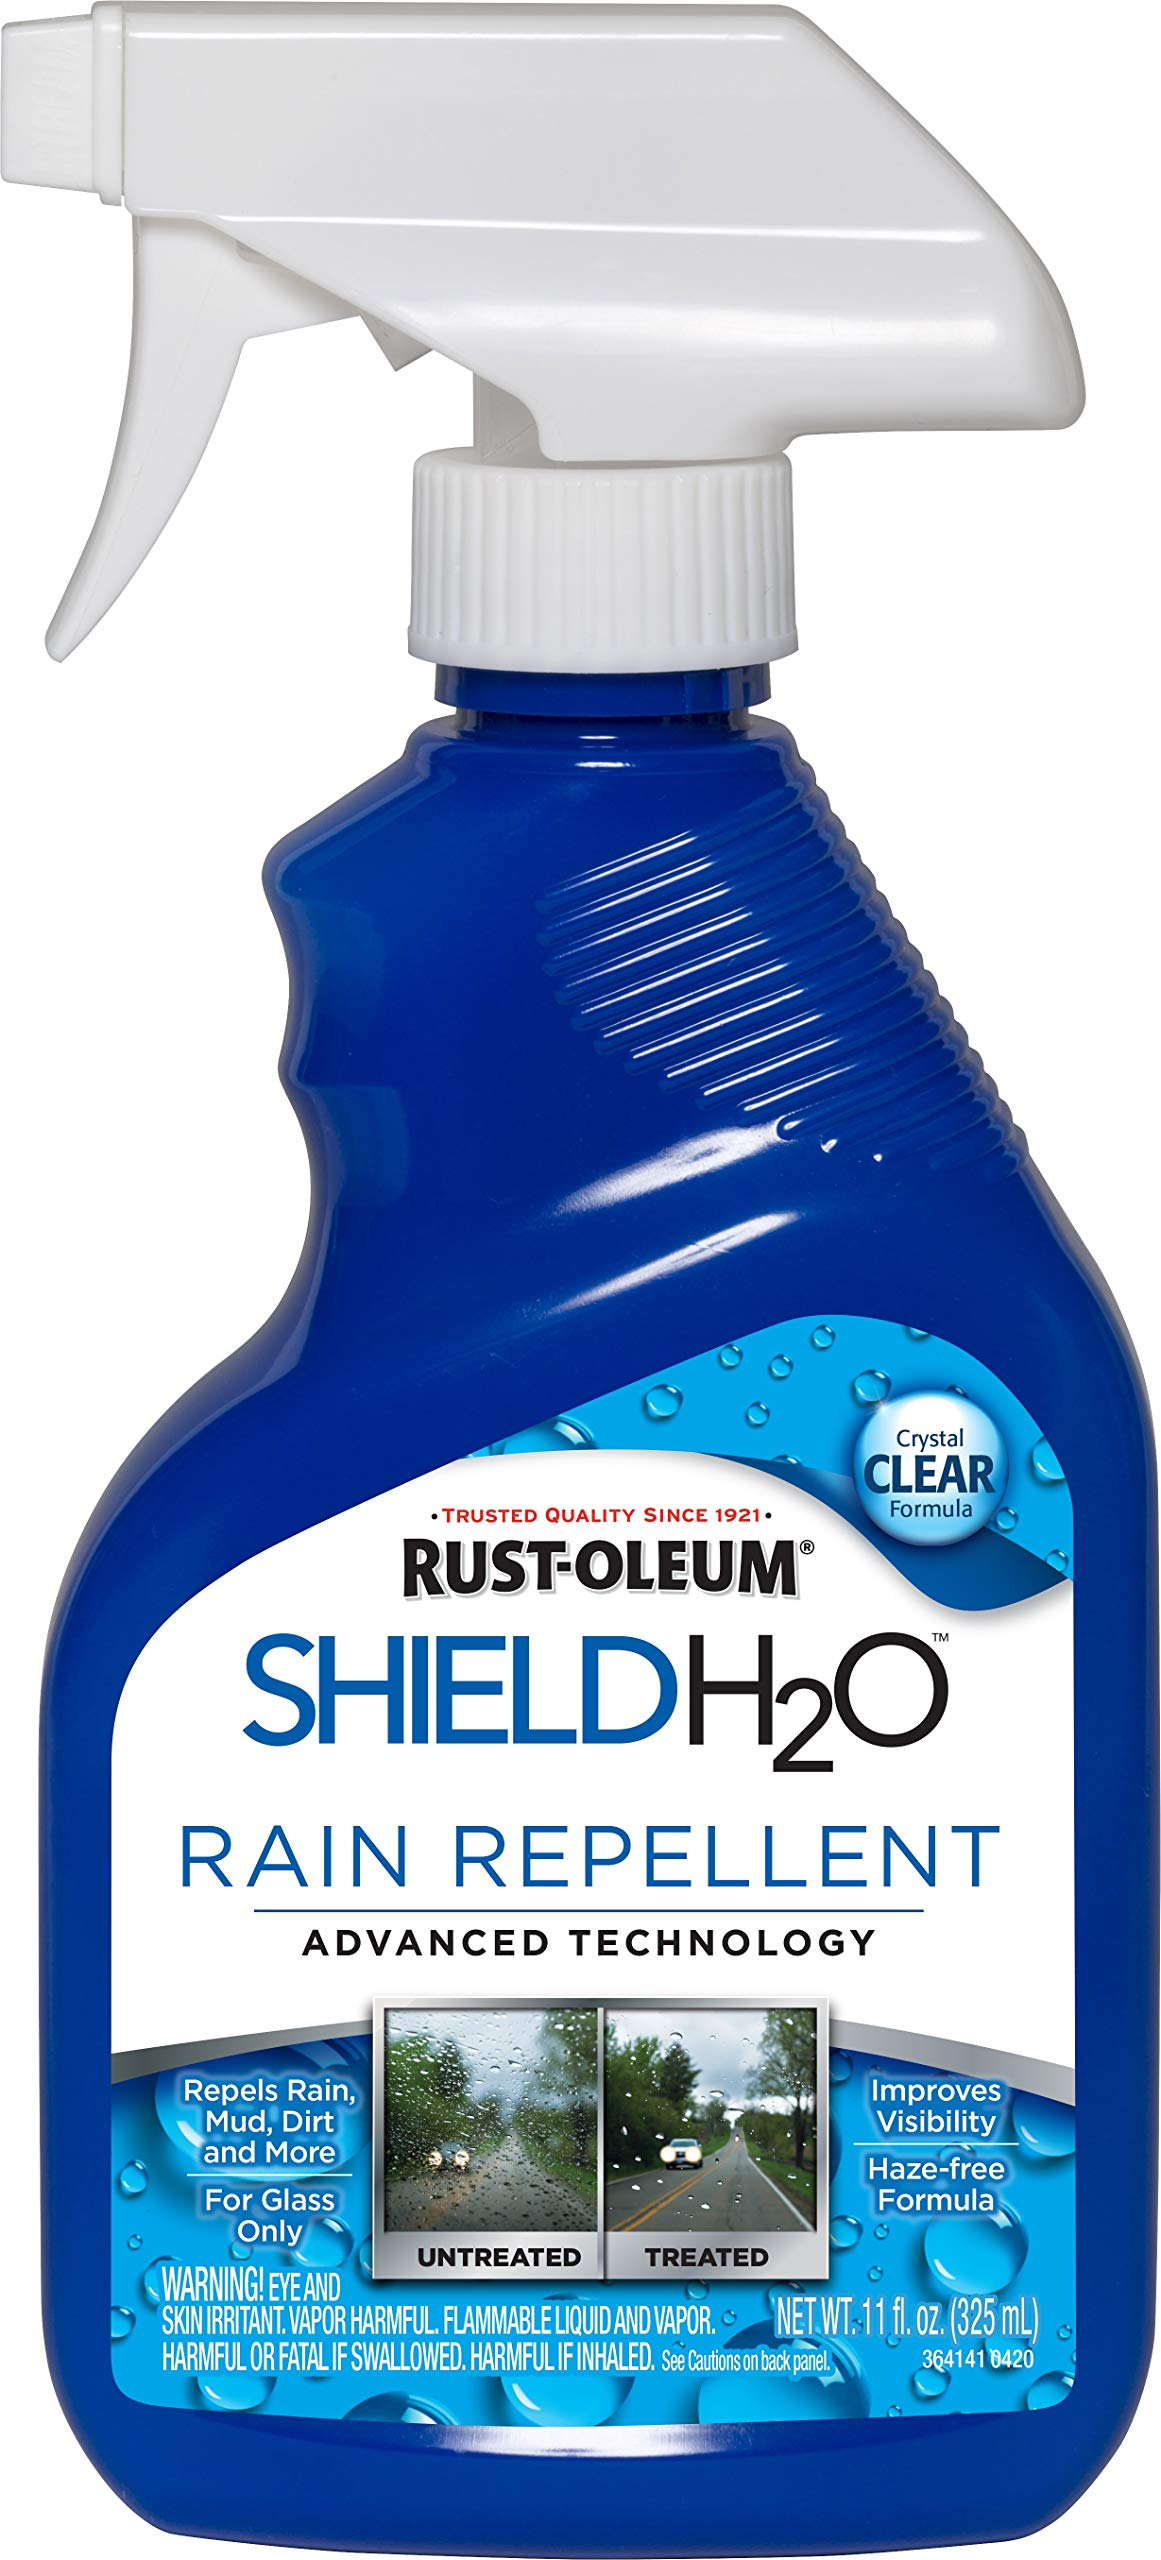 Rust-Oleum Shield H2O Rain Repellent Spray, 11 oz, Clear